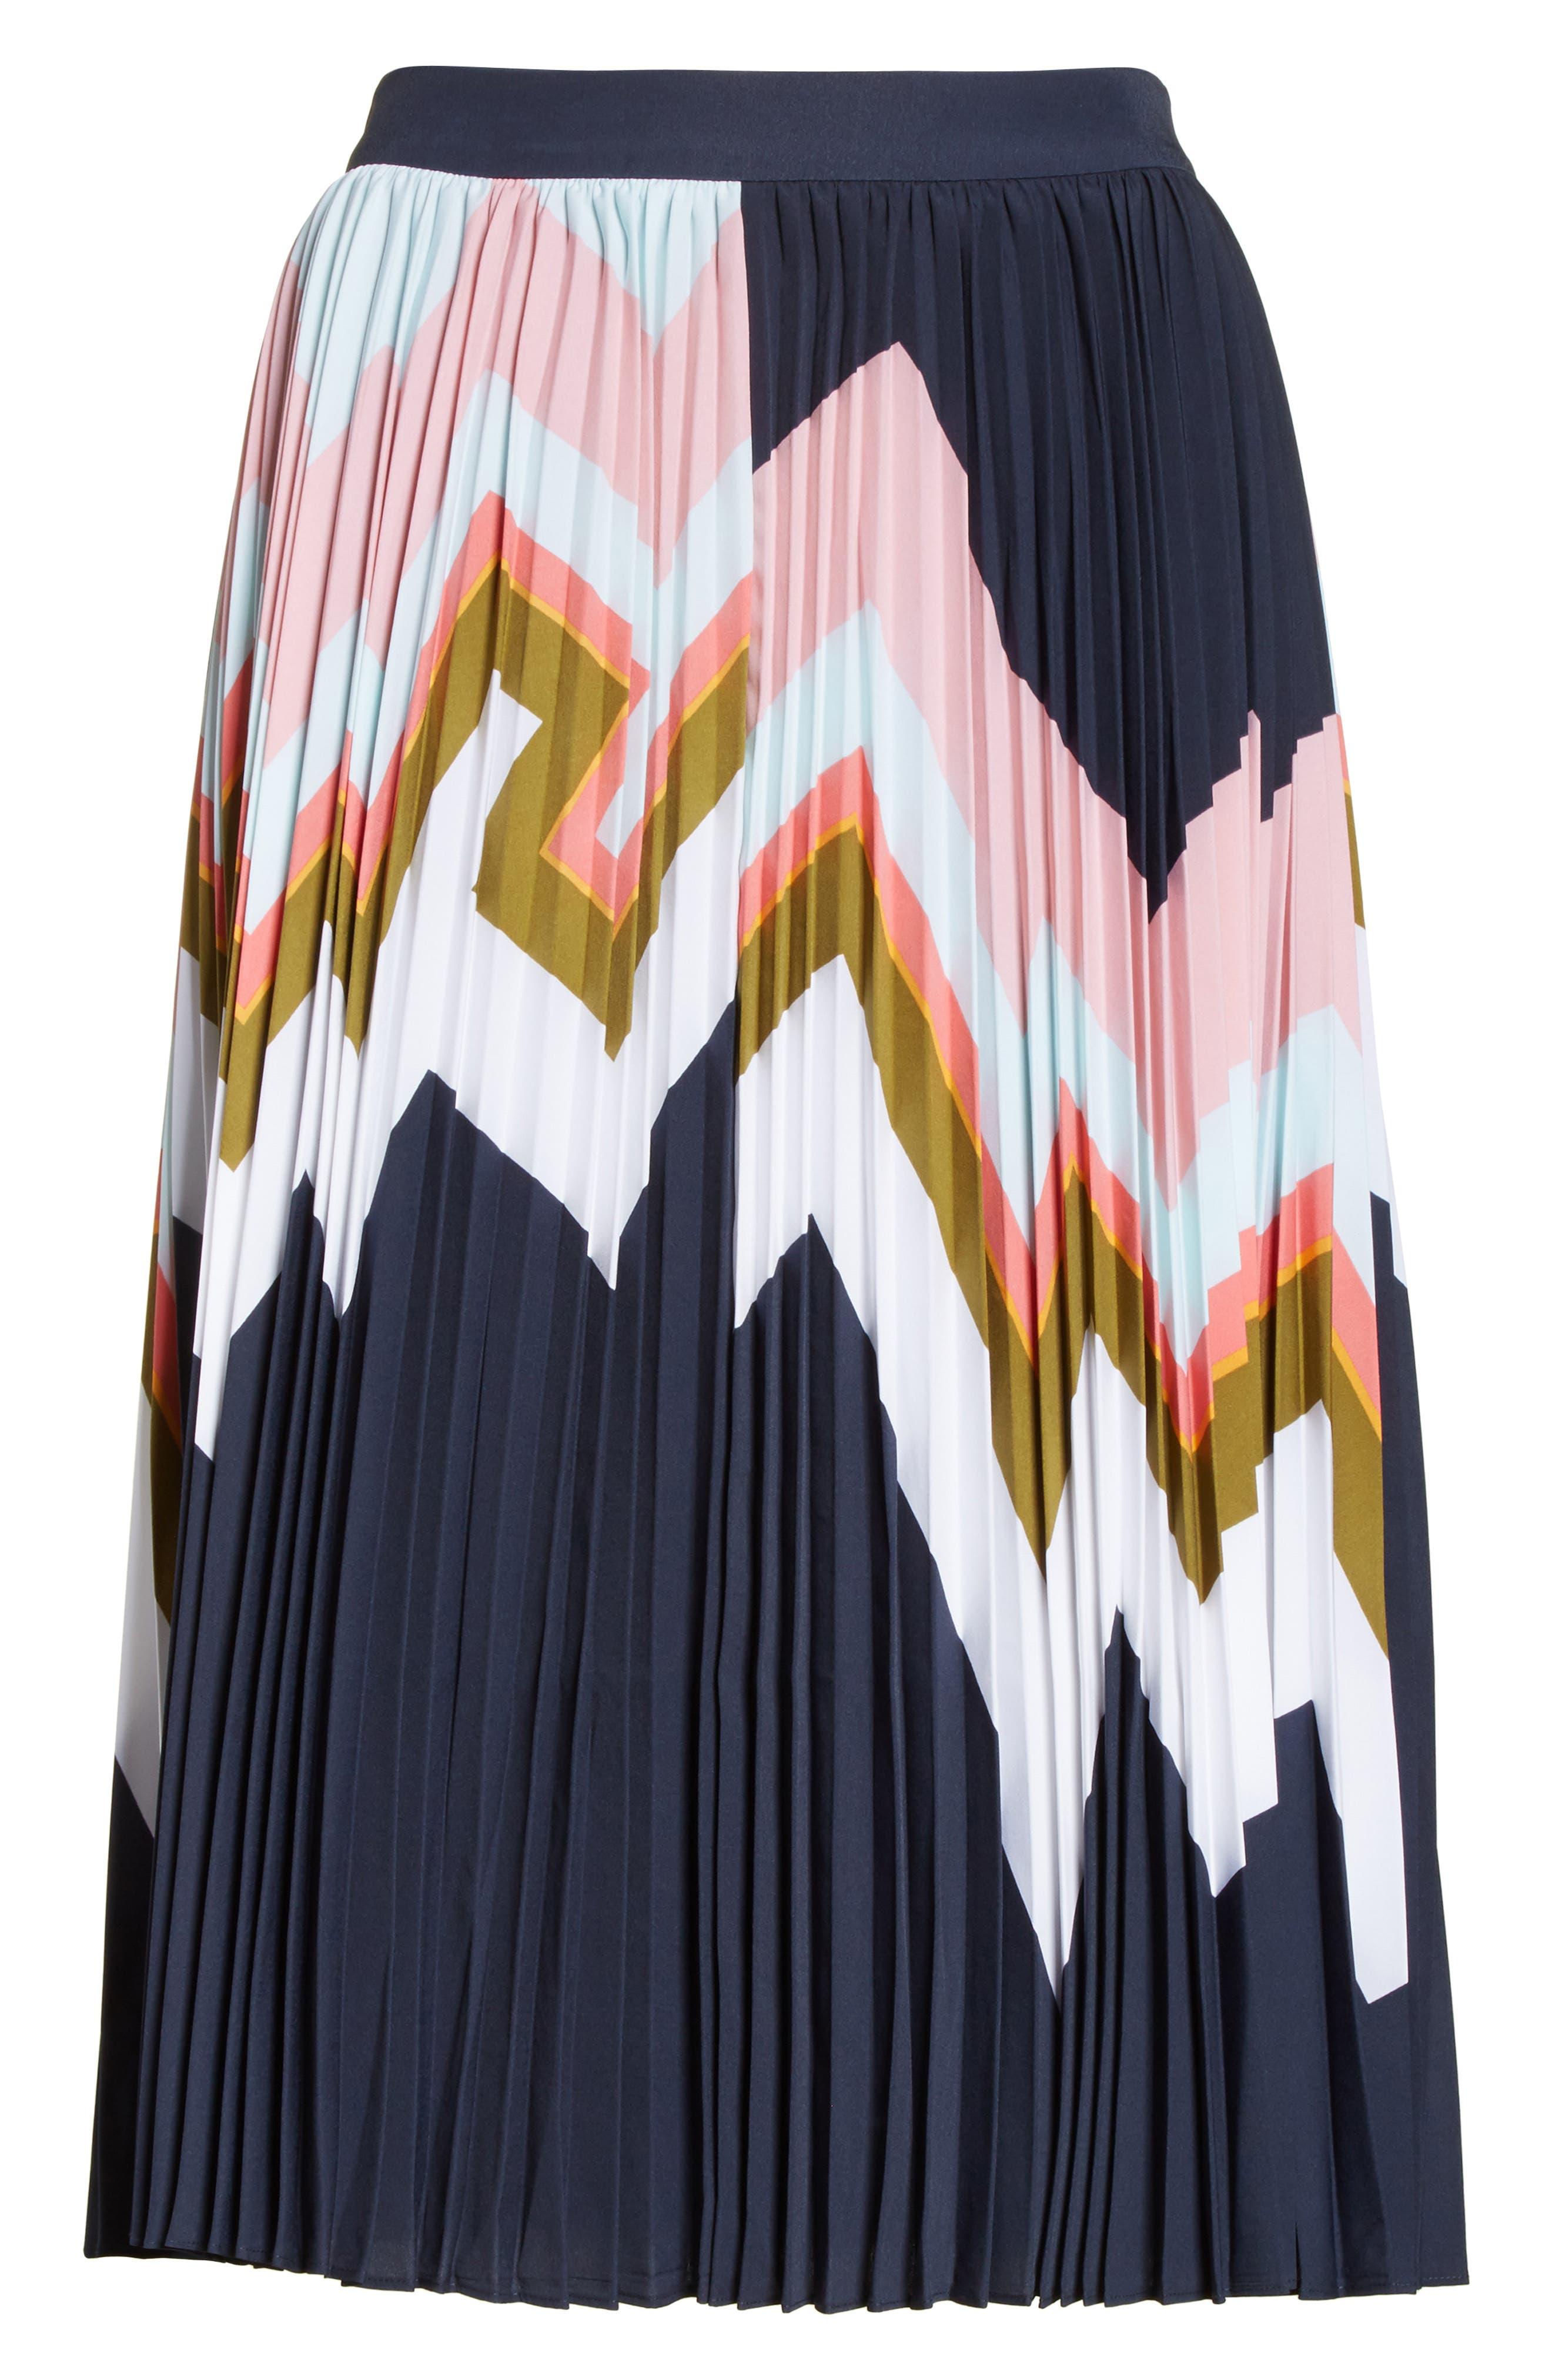 Evianna Mississippi Print Pleated Skirt,                             Alternate thumbnail 6, color,                             410